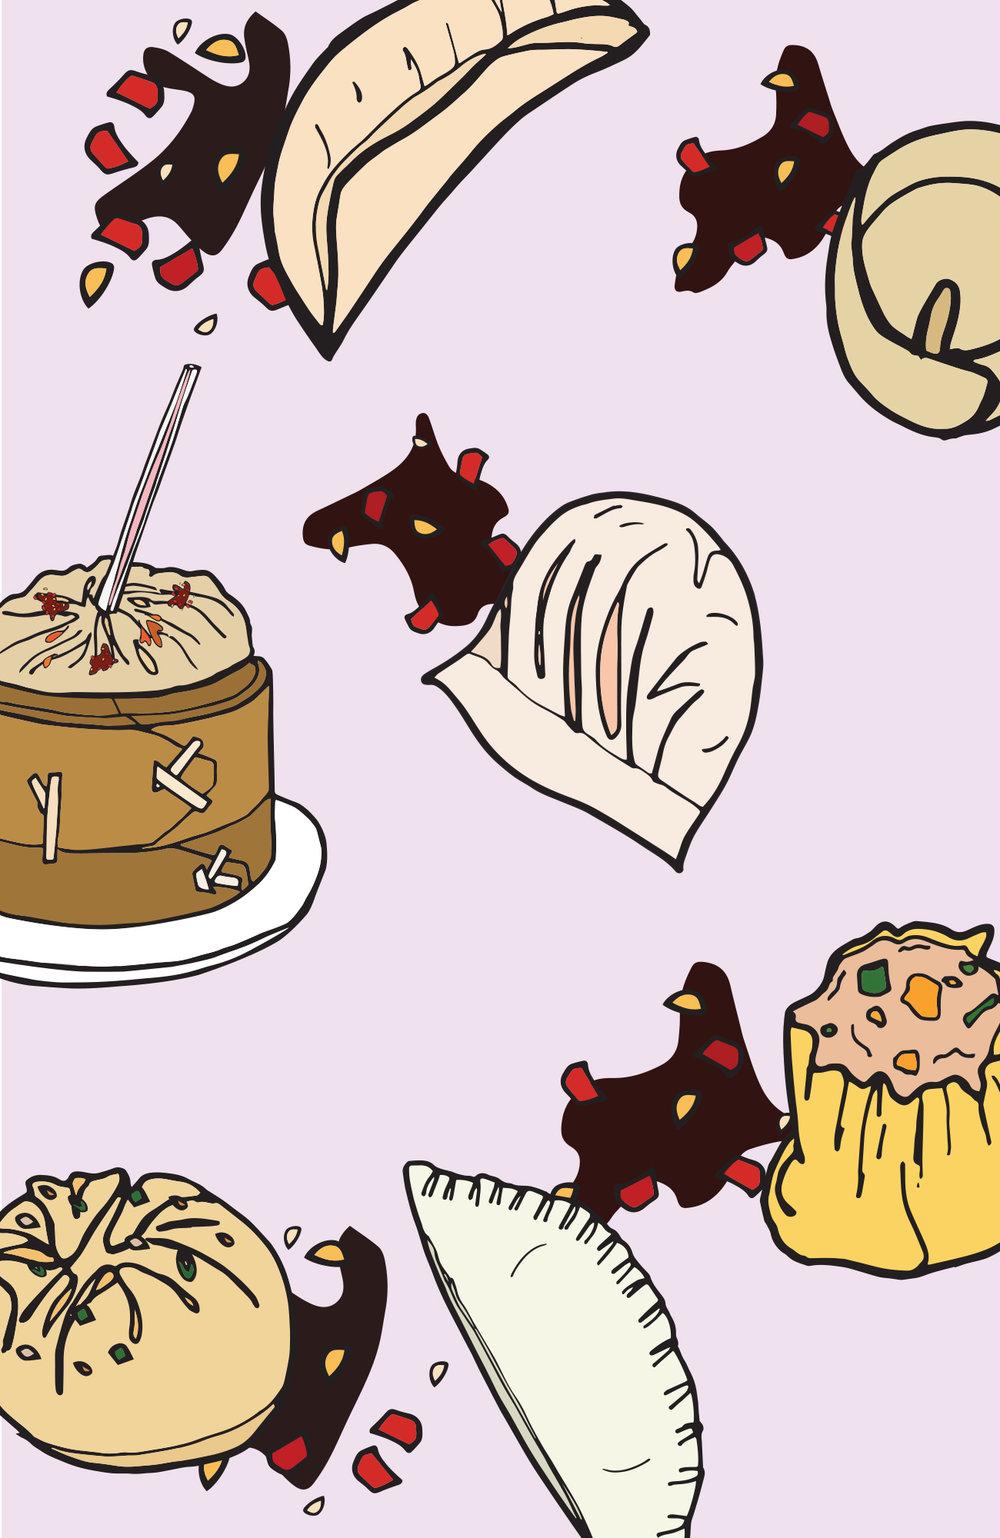 petite-street-dumpling-day-phone-wallpaper.jpg